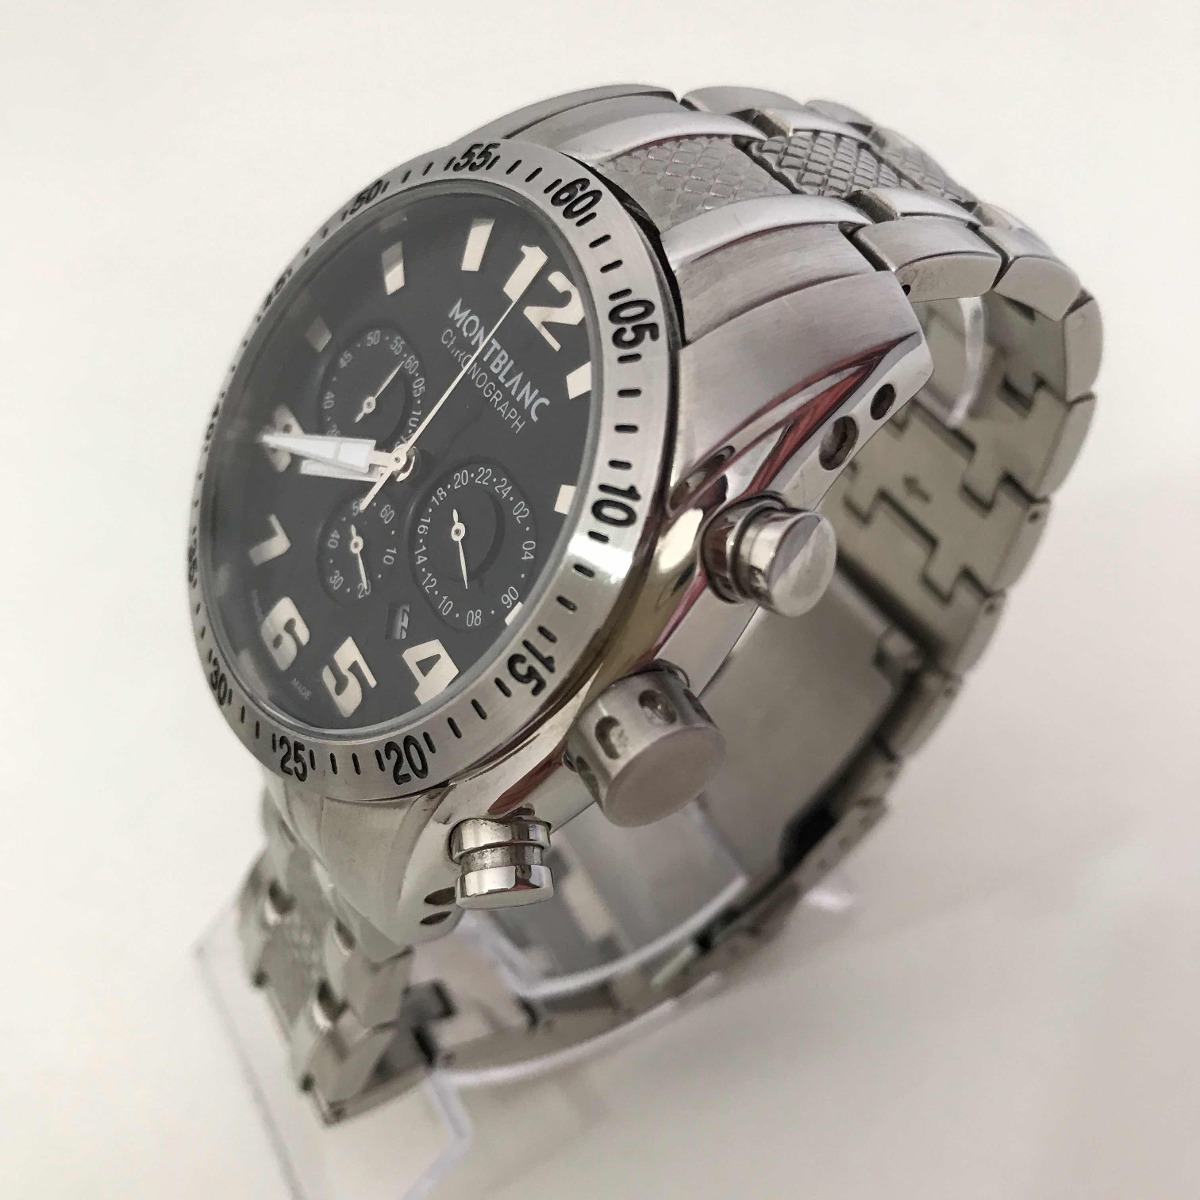 7f2d557c1f6 Relógio Montblanc Prata Fundo Preto